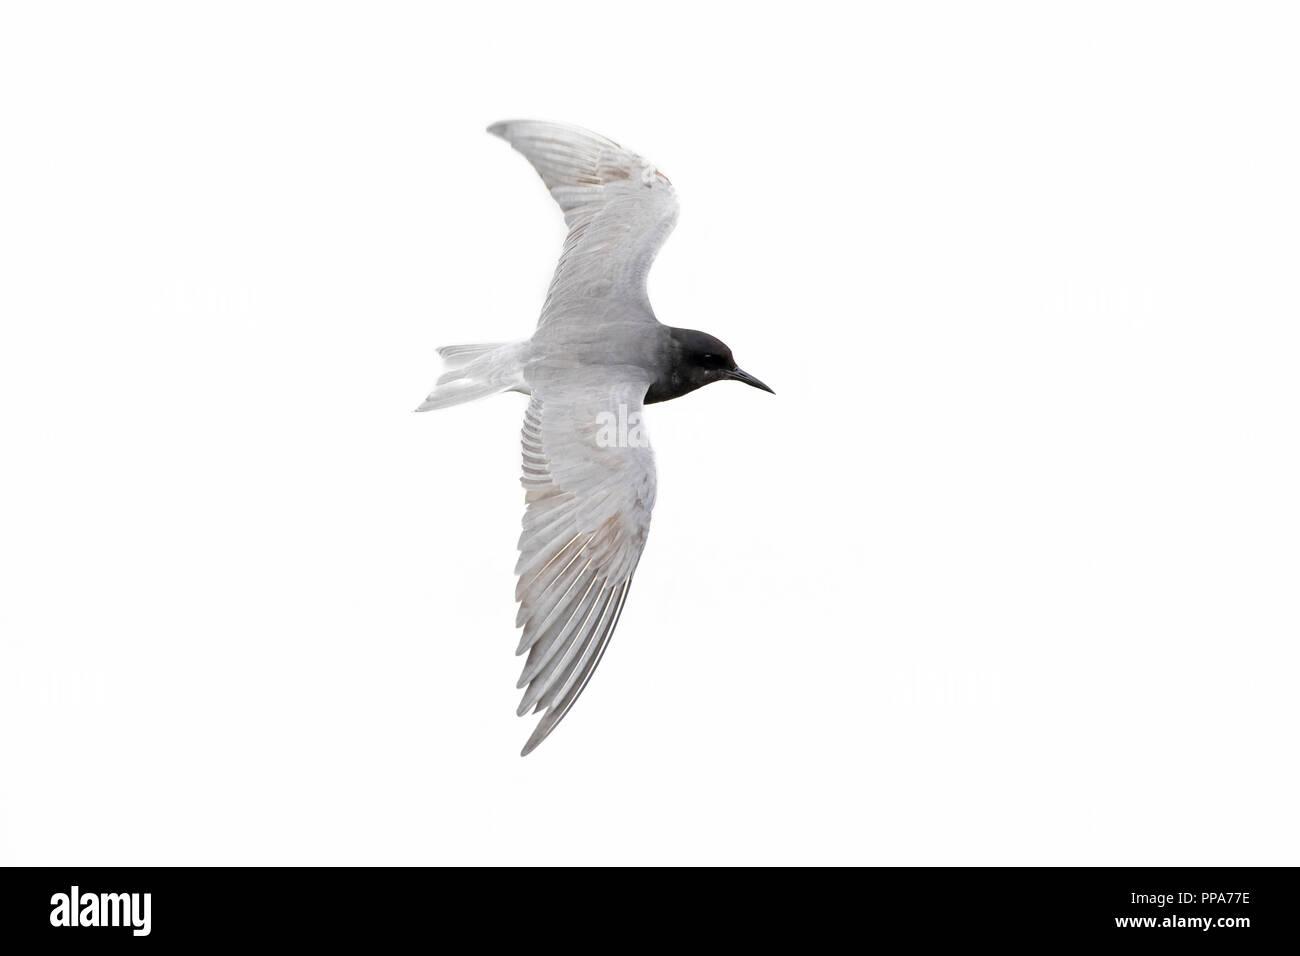 Black tern (Chlidonias niger) in breeding plumage flying against white background - Stock Image